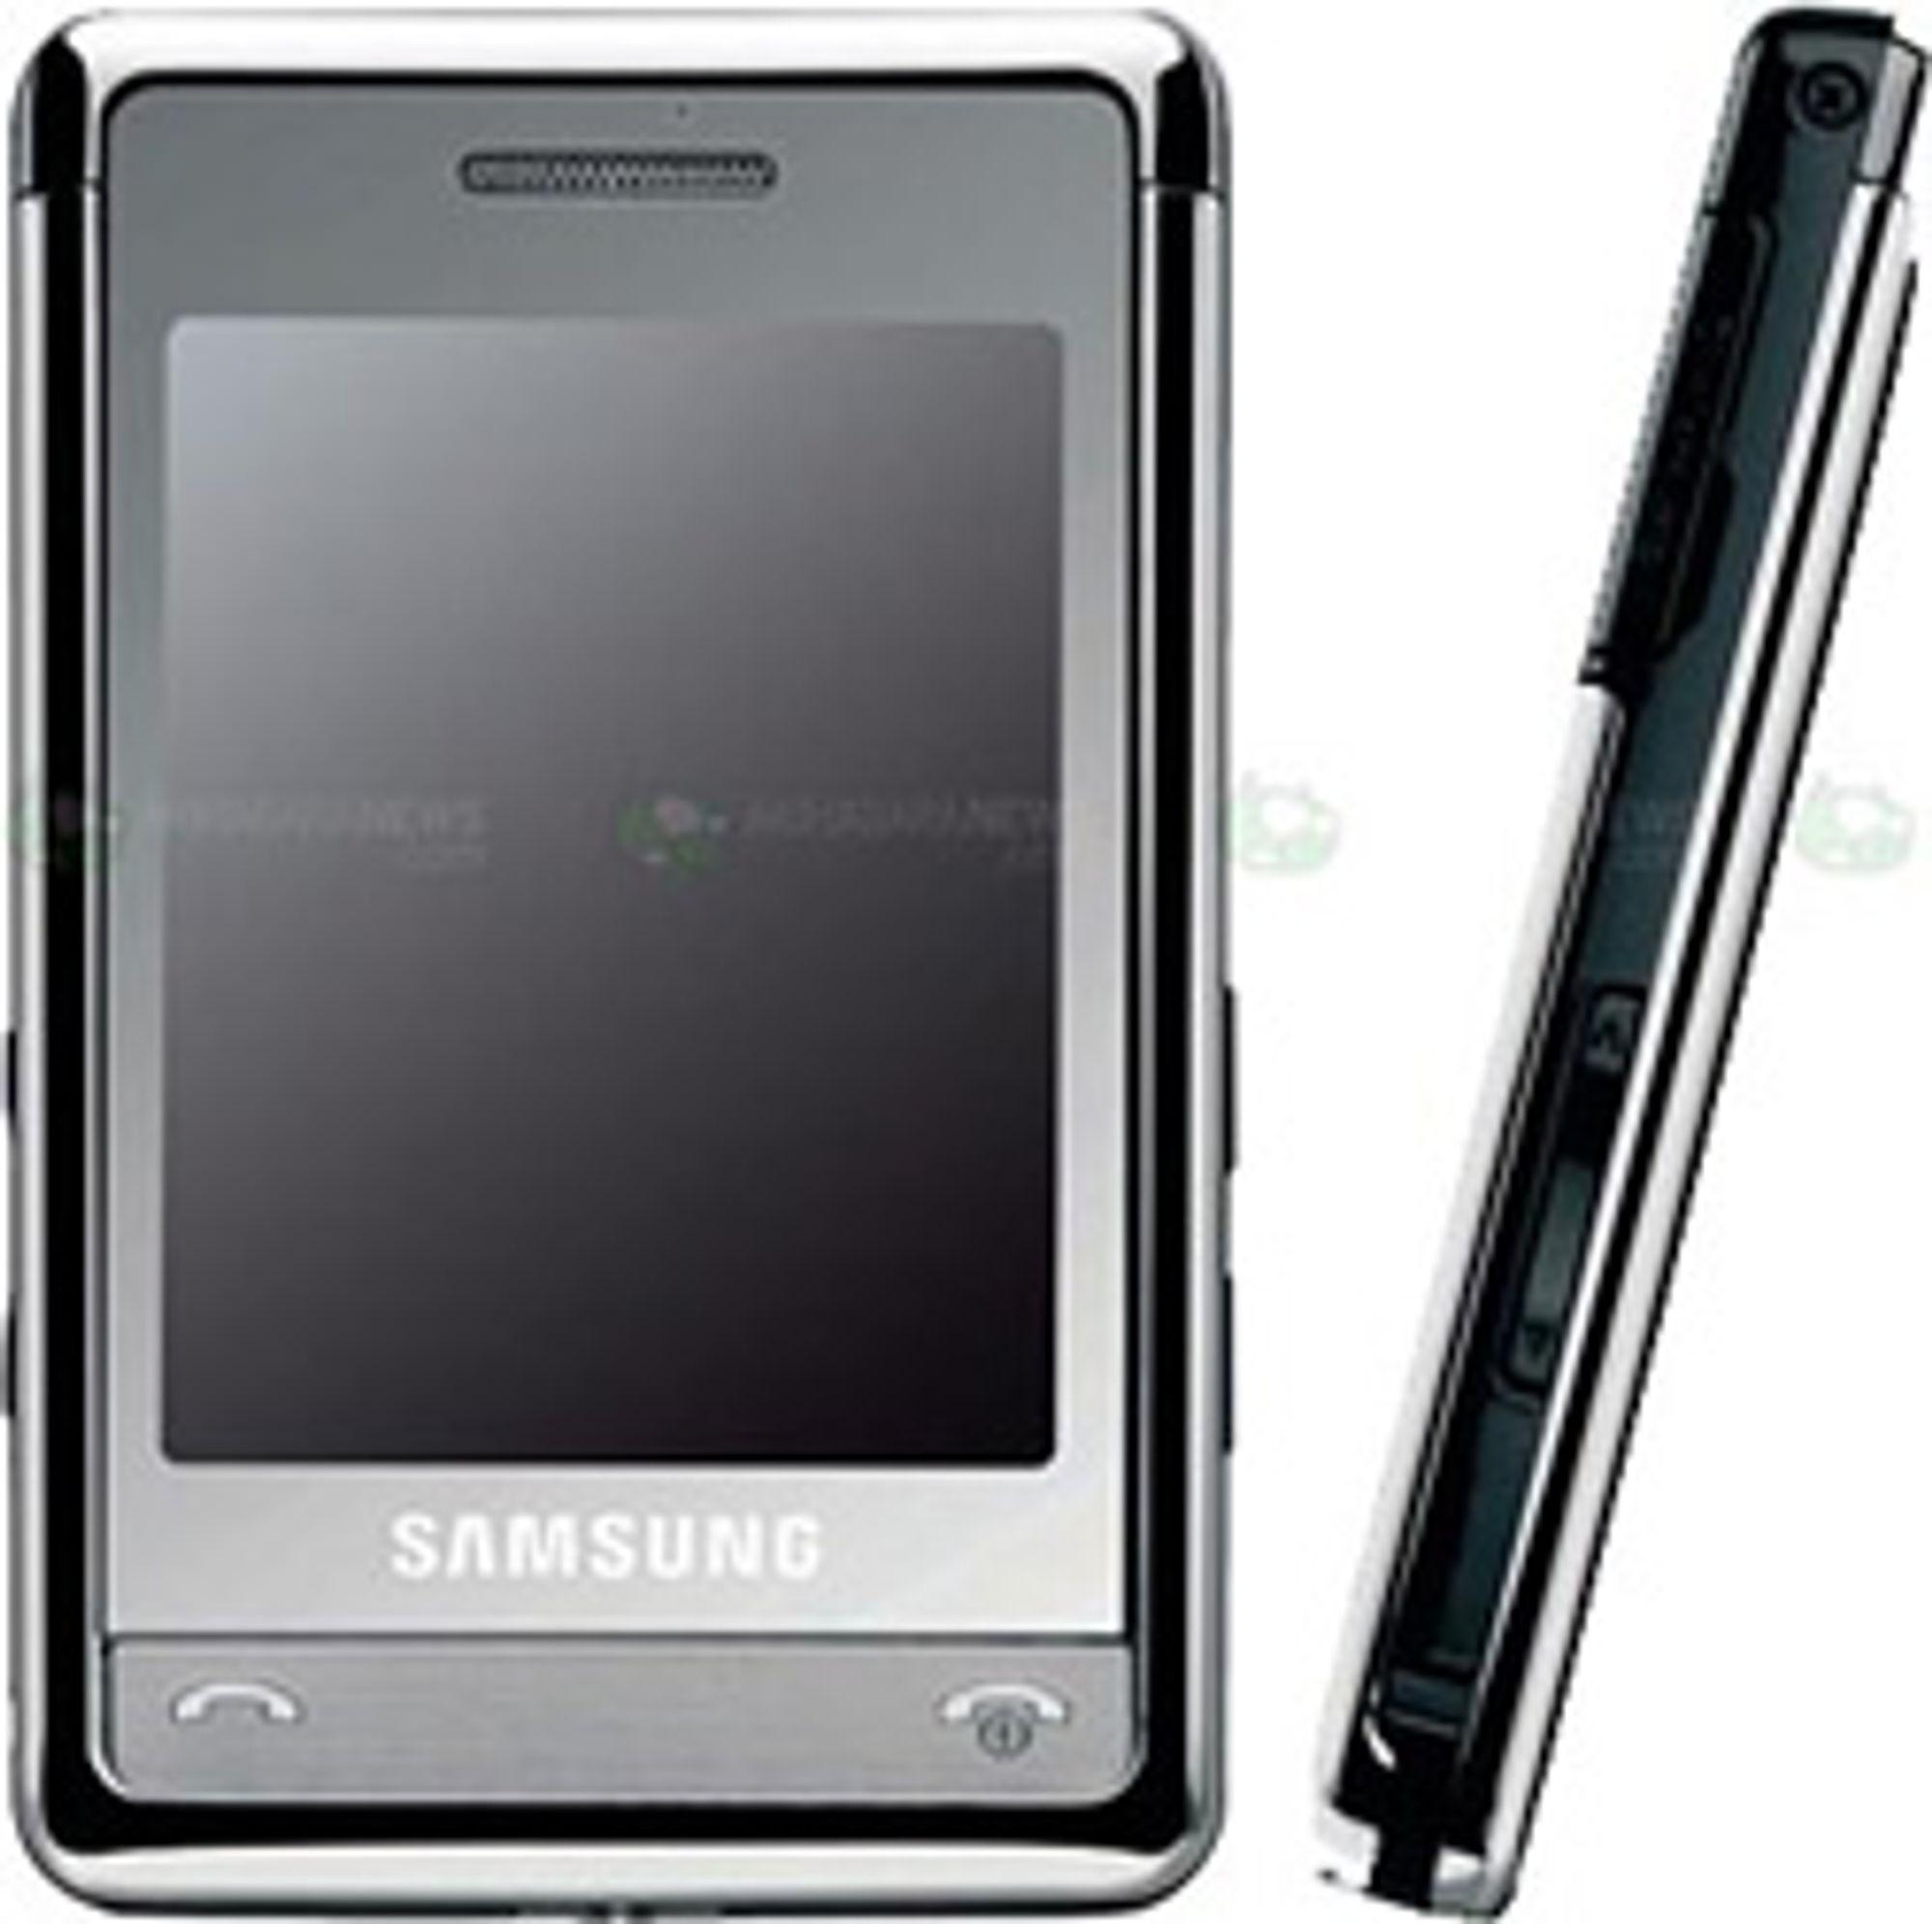 Samsungs P520 (Foto: Mobile Magazine)